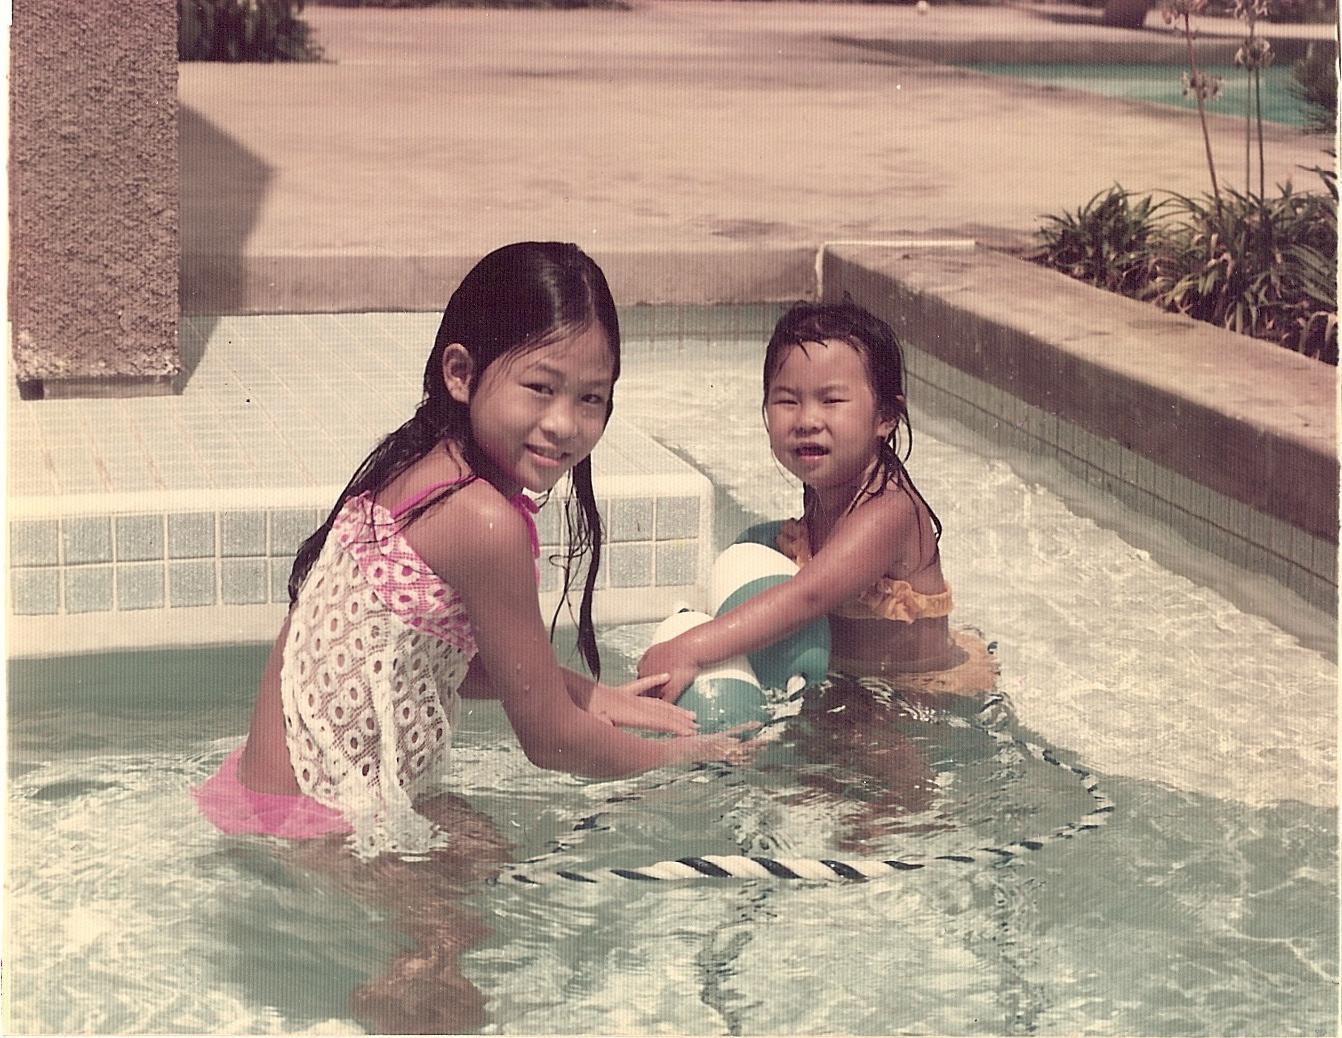 Swimming with Linda